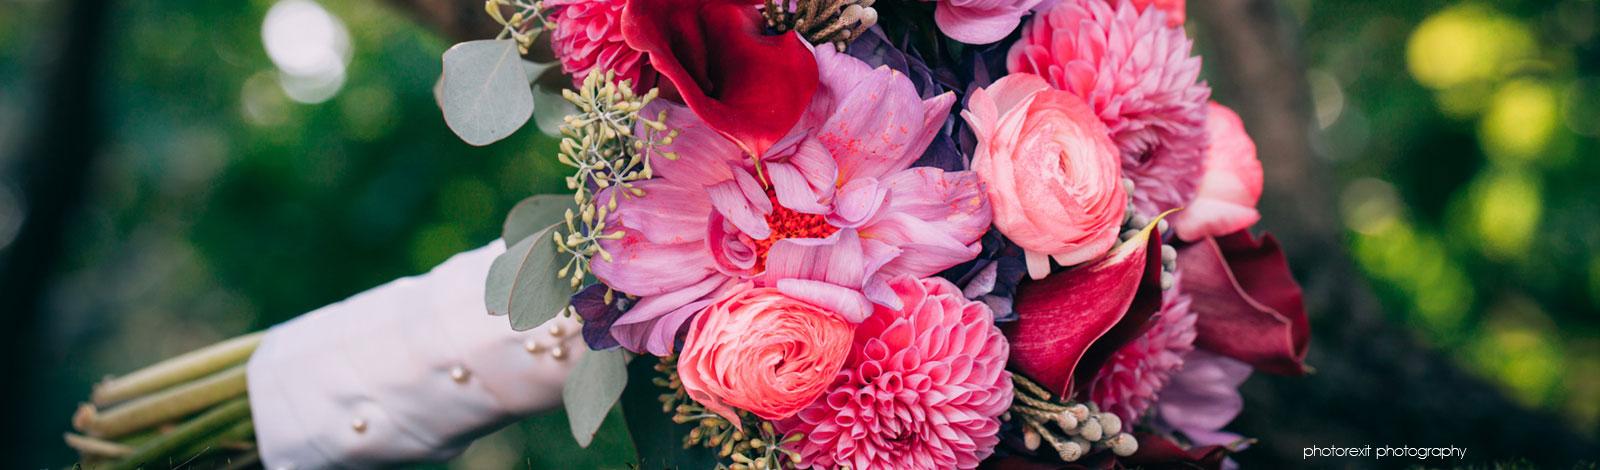 rachel-adams-bouquet slider